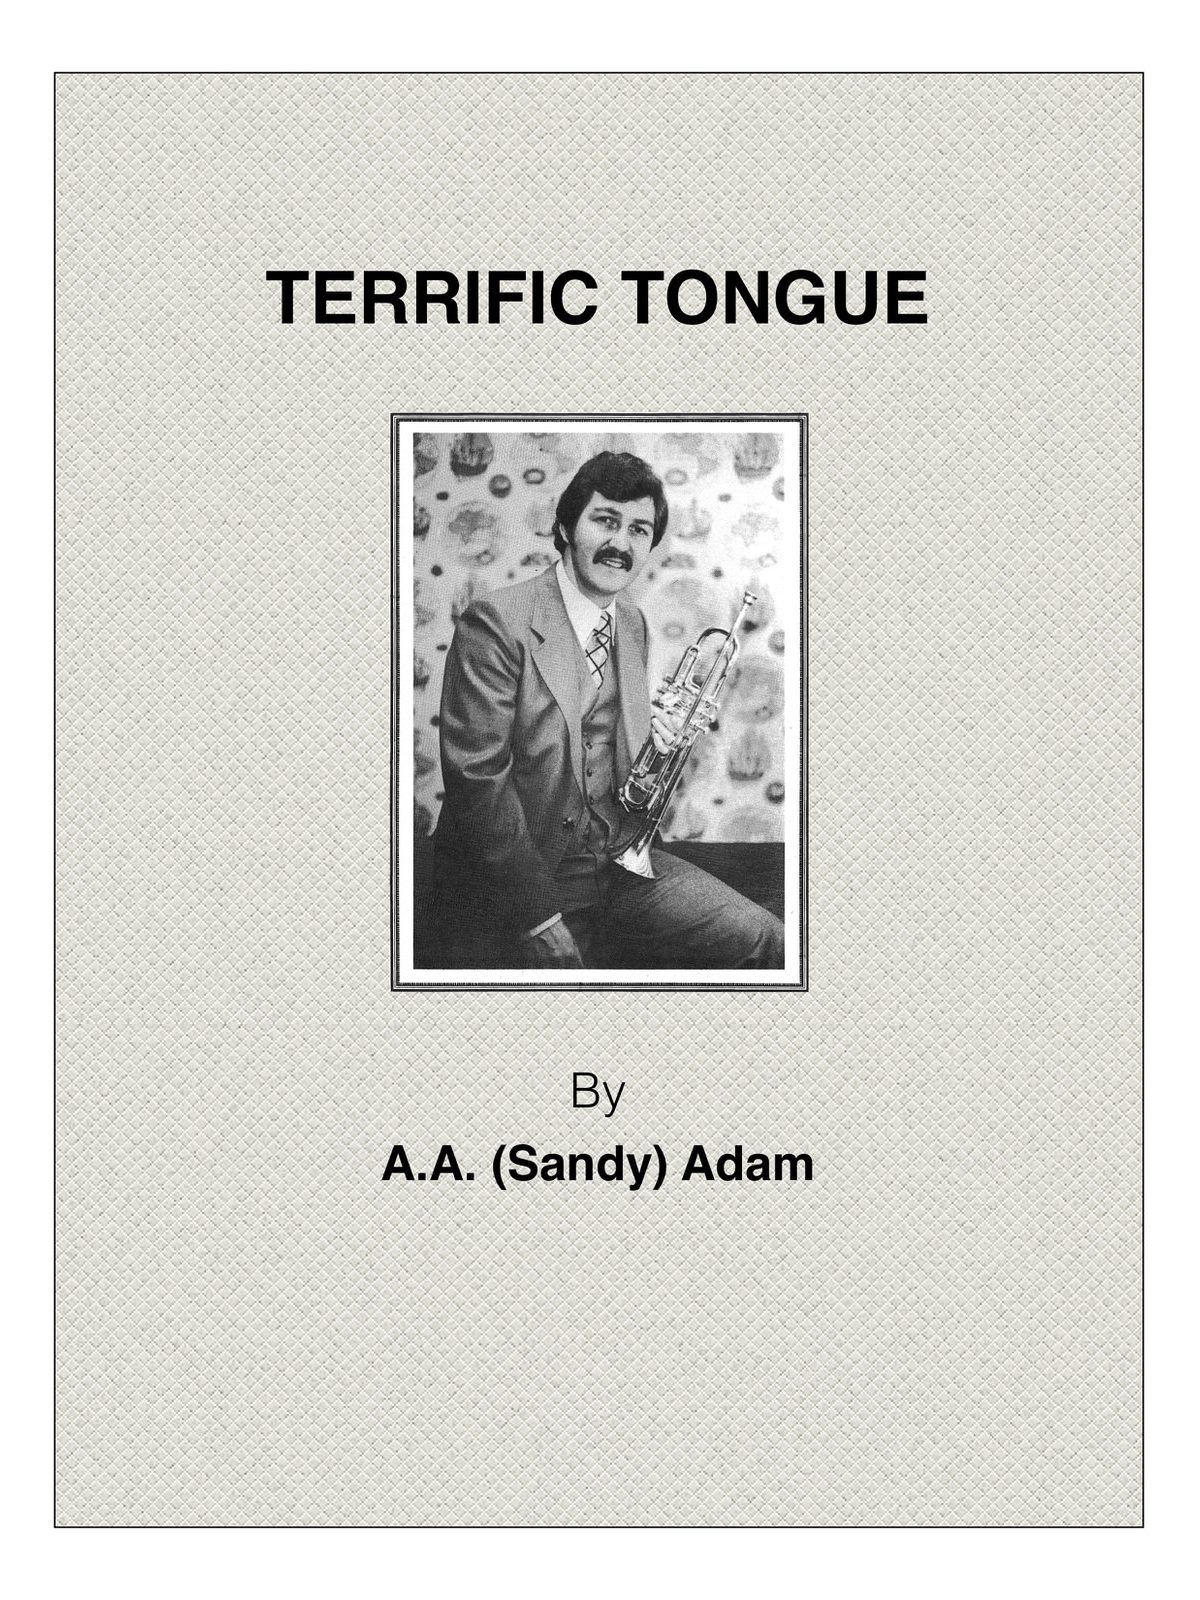 Adam, Terrific Tongue